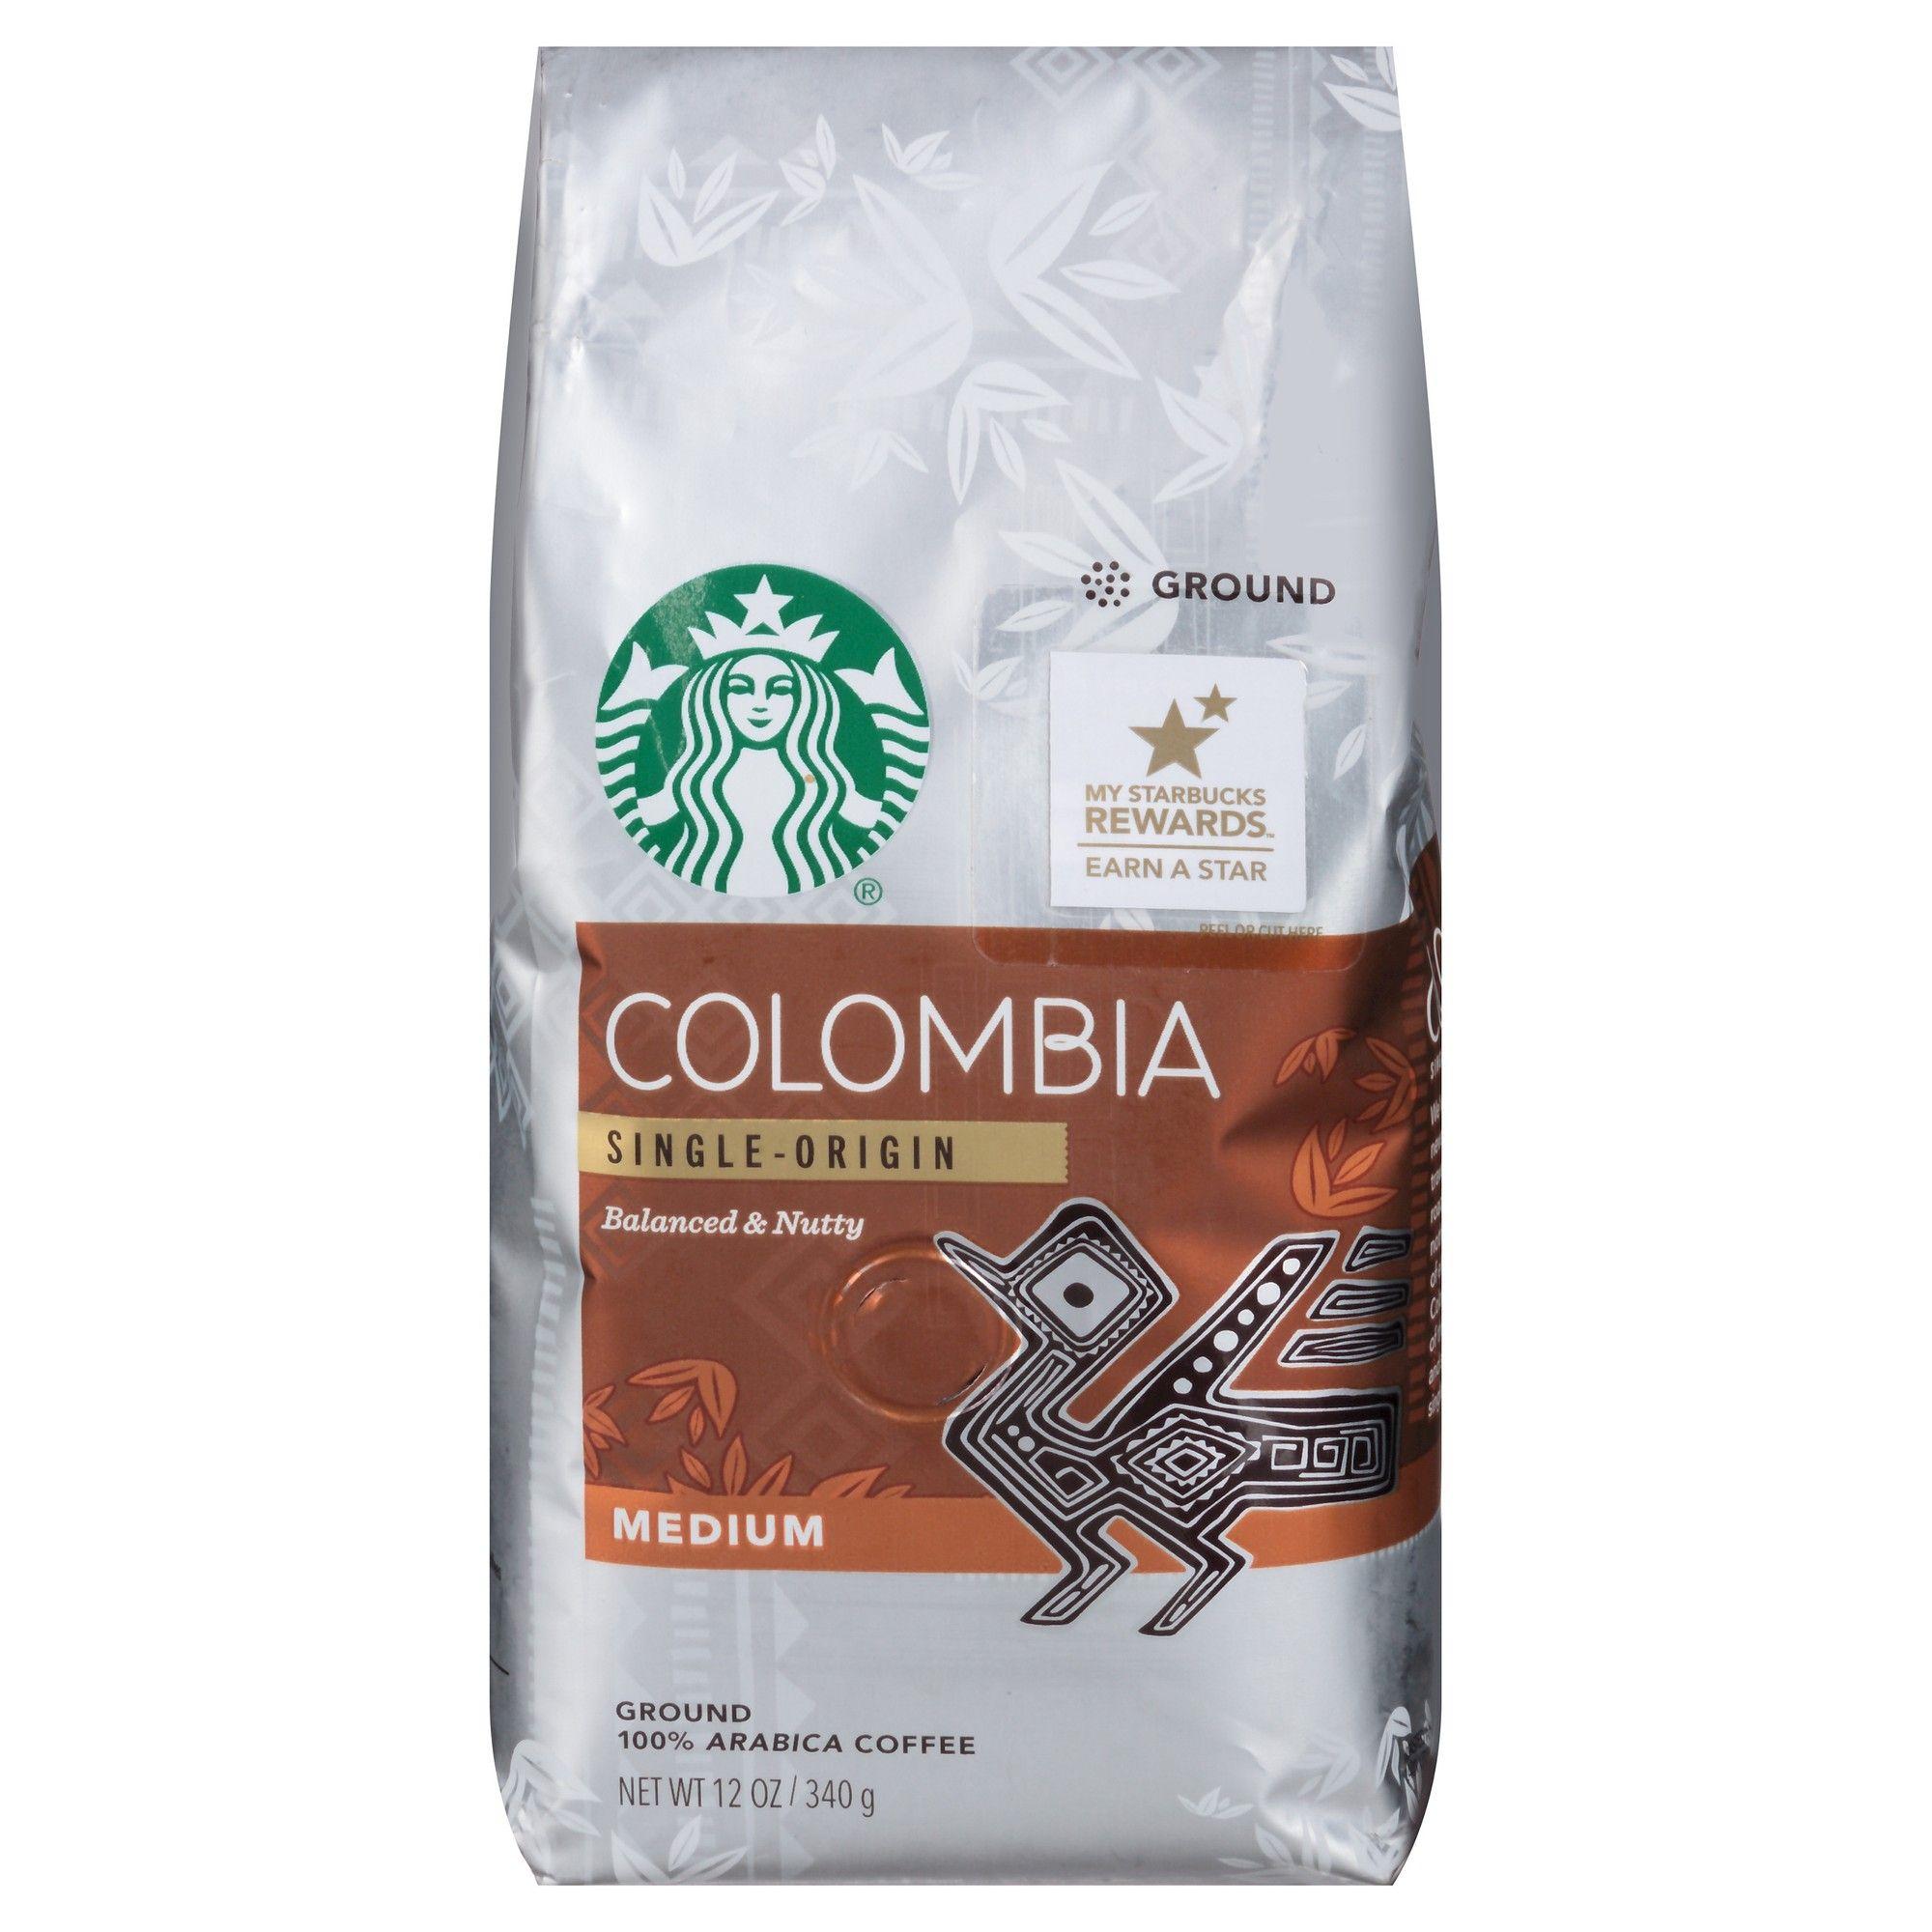 Starbucks colombia medium roast ground coffee 12oz